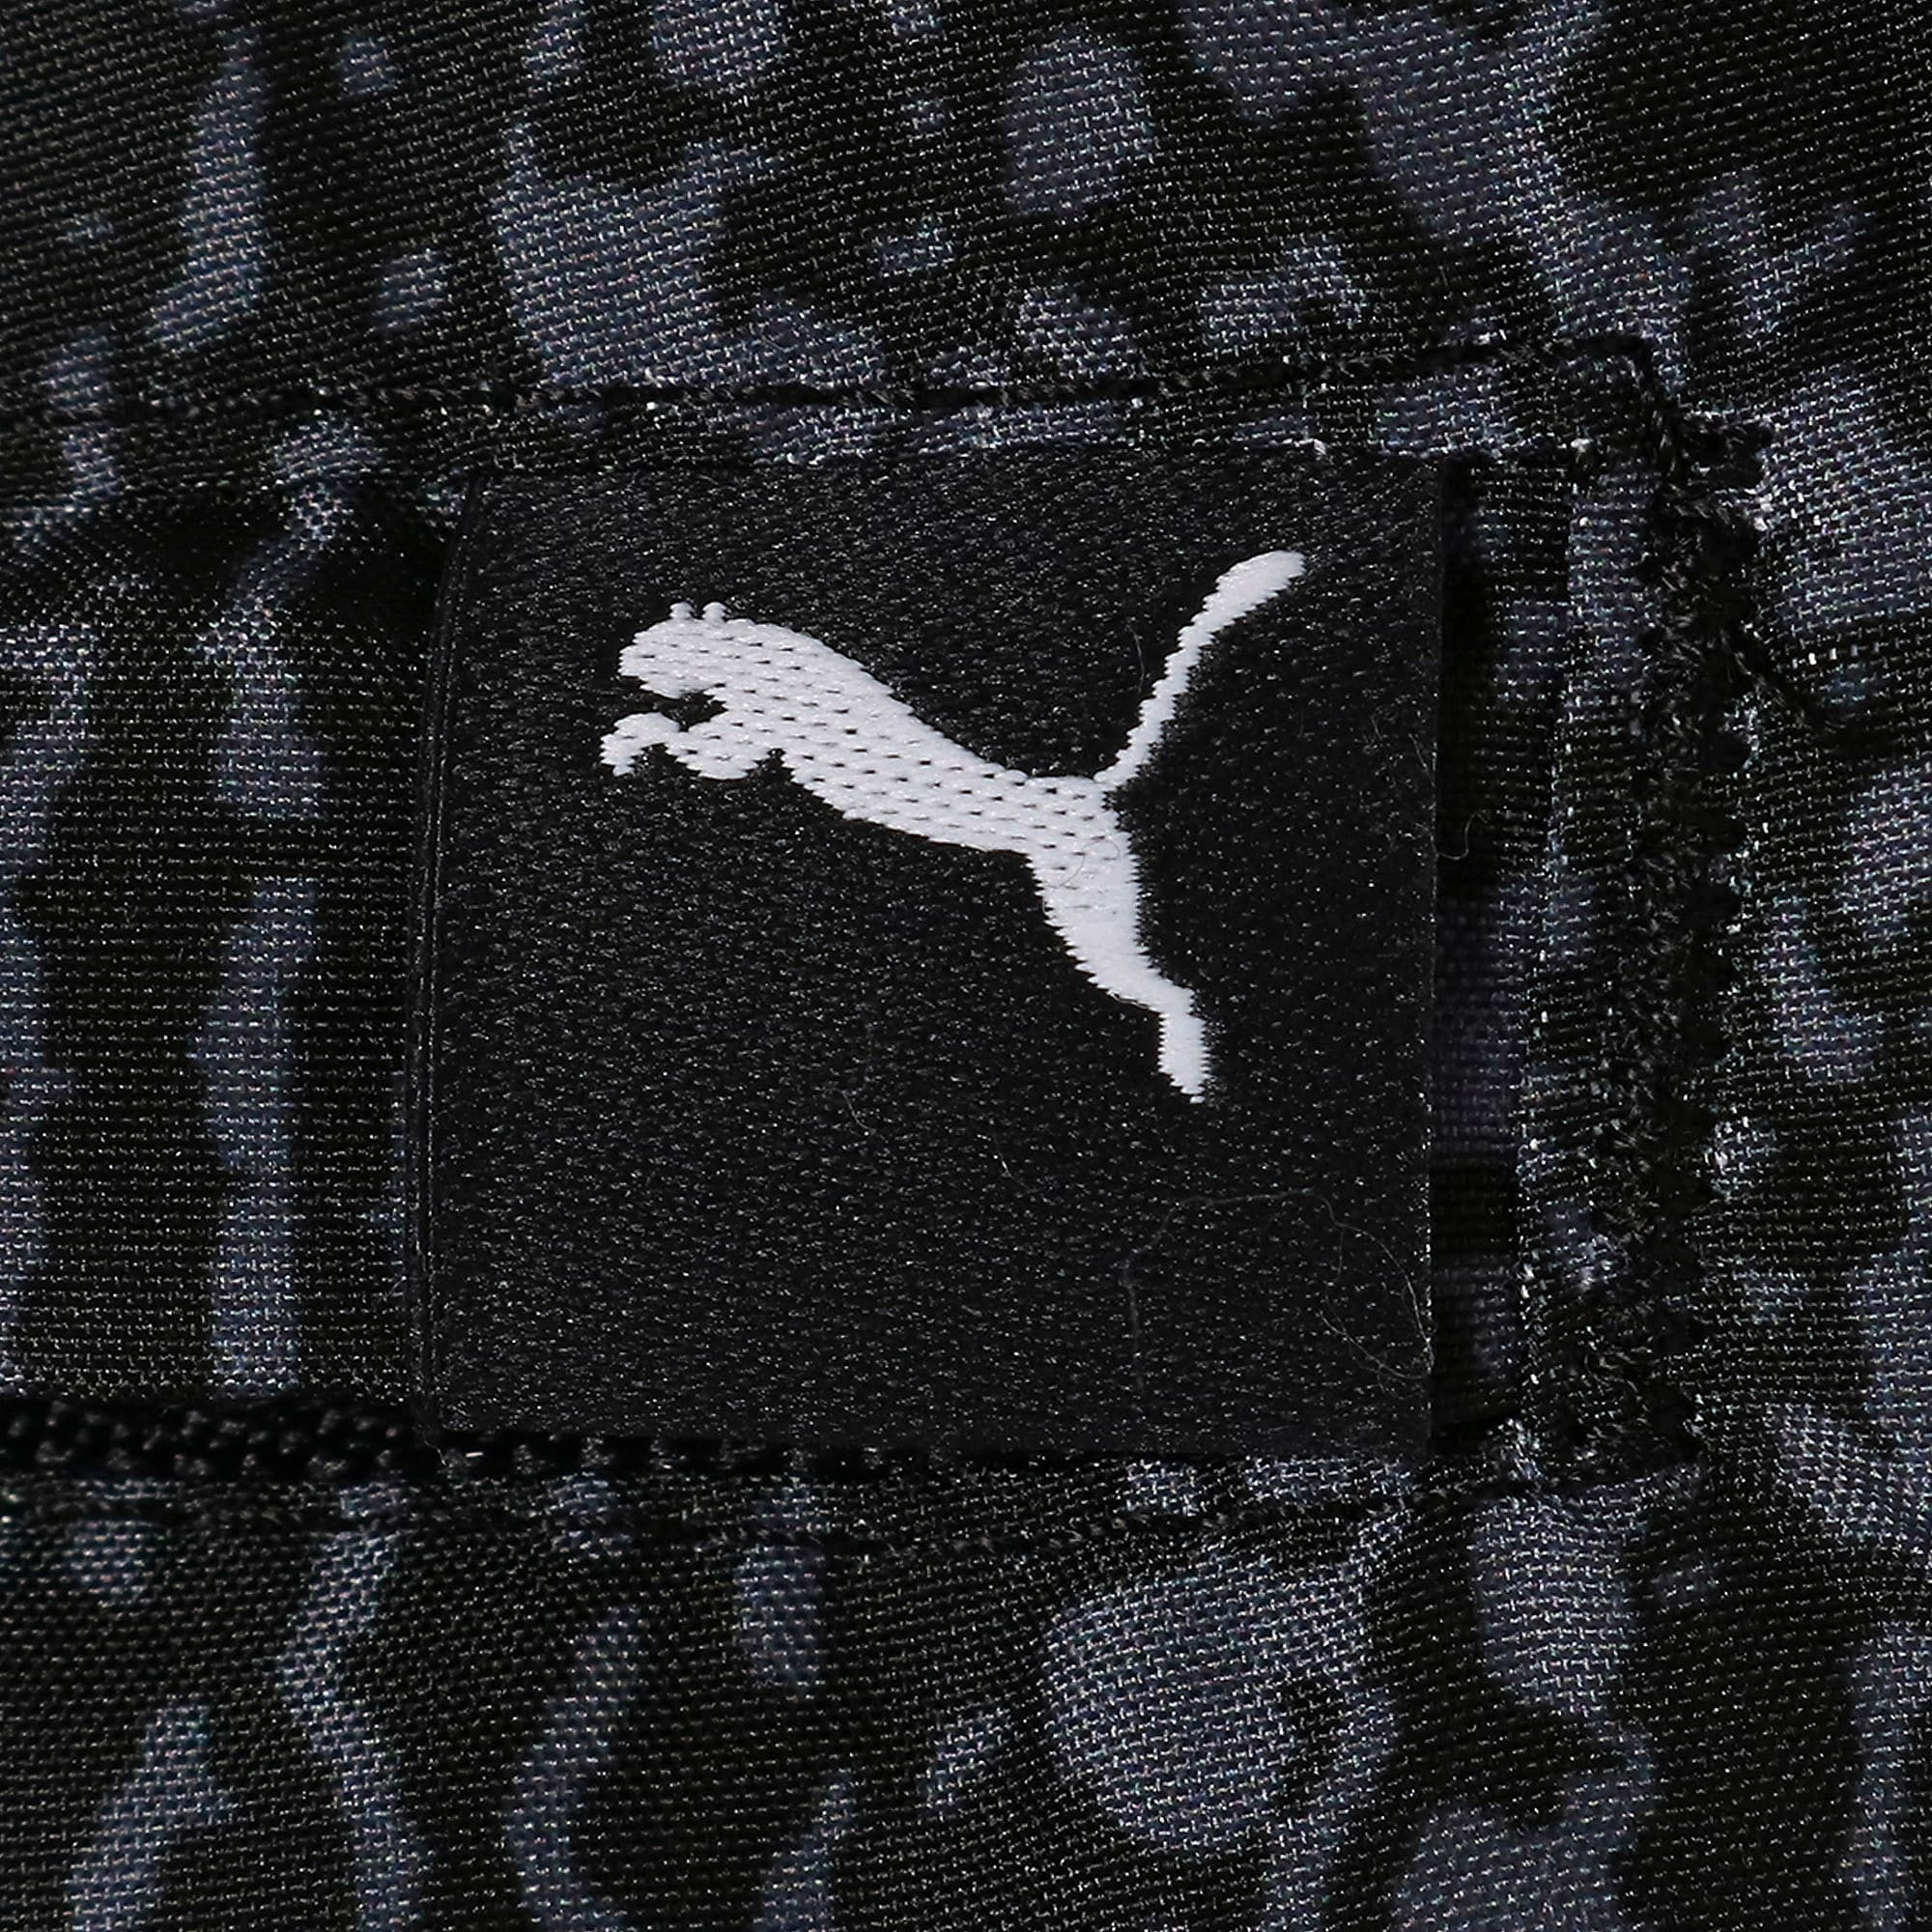 Thumbnail 4 of SNAKE PACK LUXTG ウーブン ショーツ, Puma Black-AOP, medium-JPN